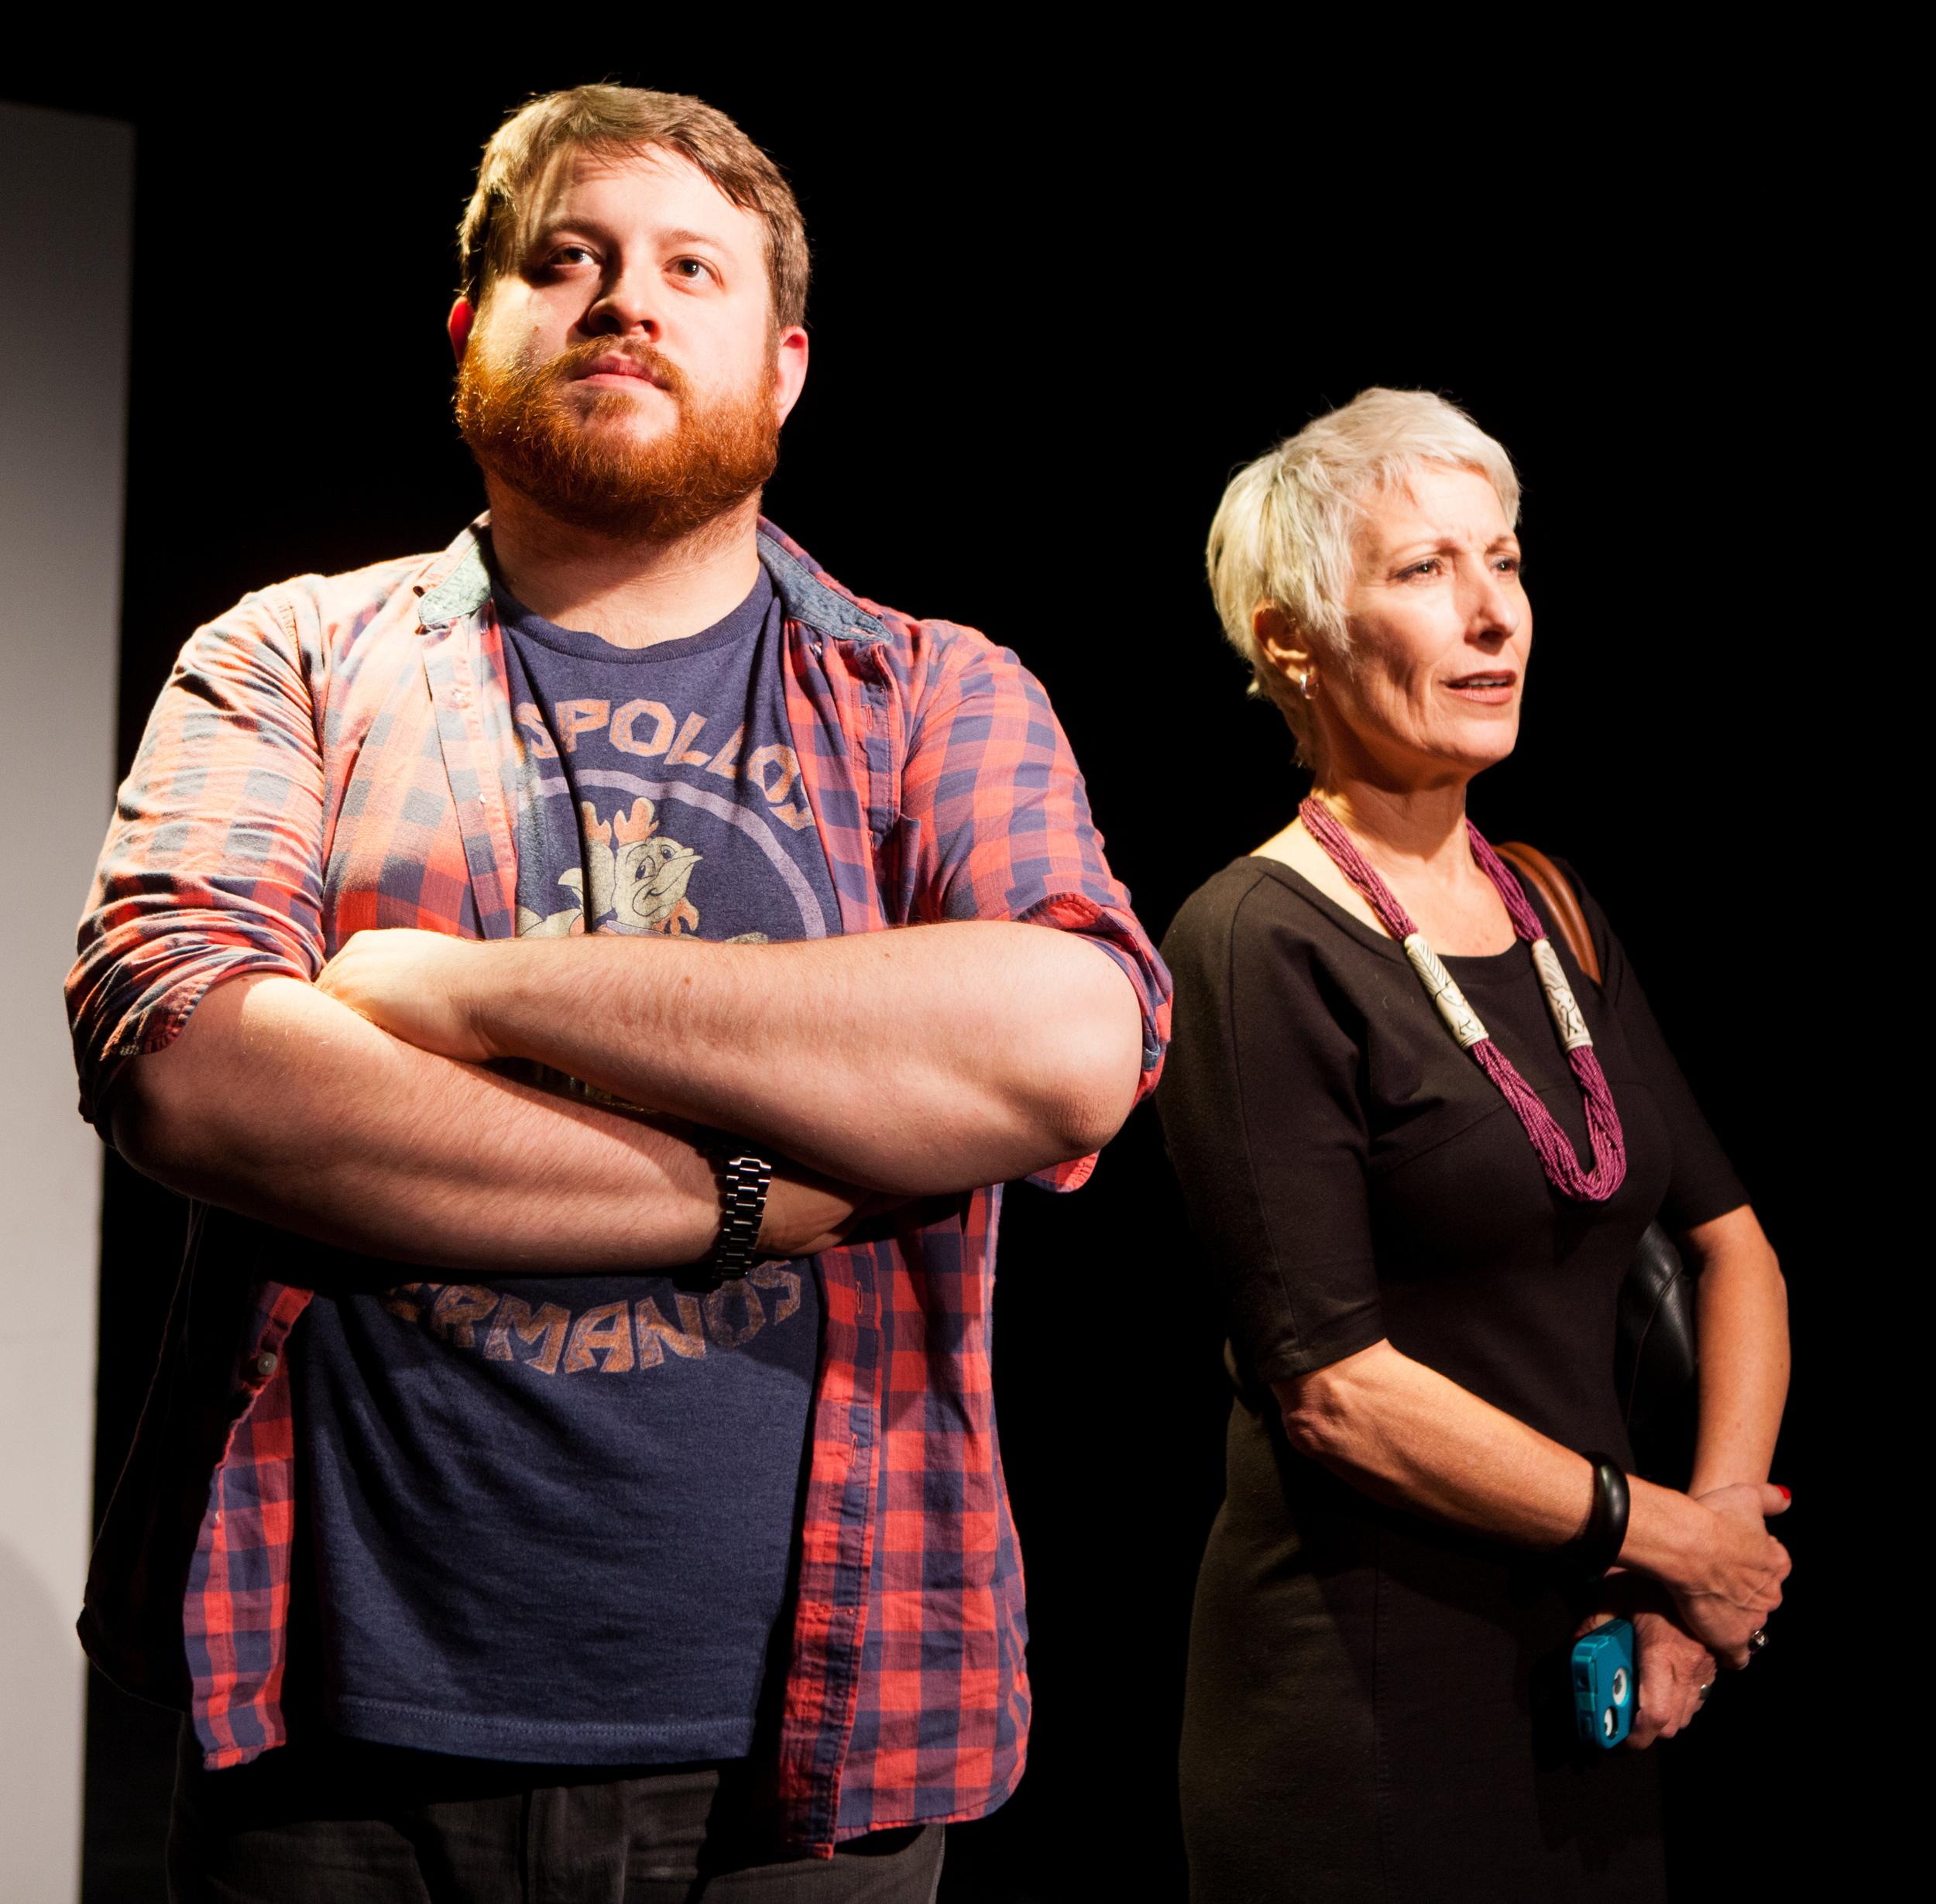 Trey K. Blackburn (Blue) &Renee Stork (Candice) in  Invasion  ; directed by Elizabeth Ostler, photo by Isaiah Tanenbaum: Theatrical Photography & Design